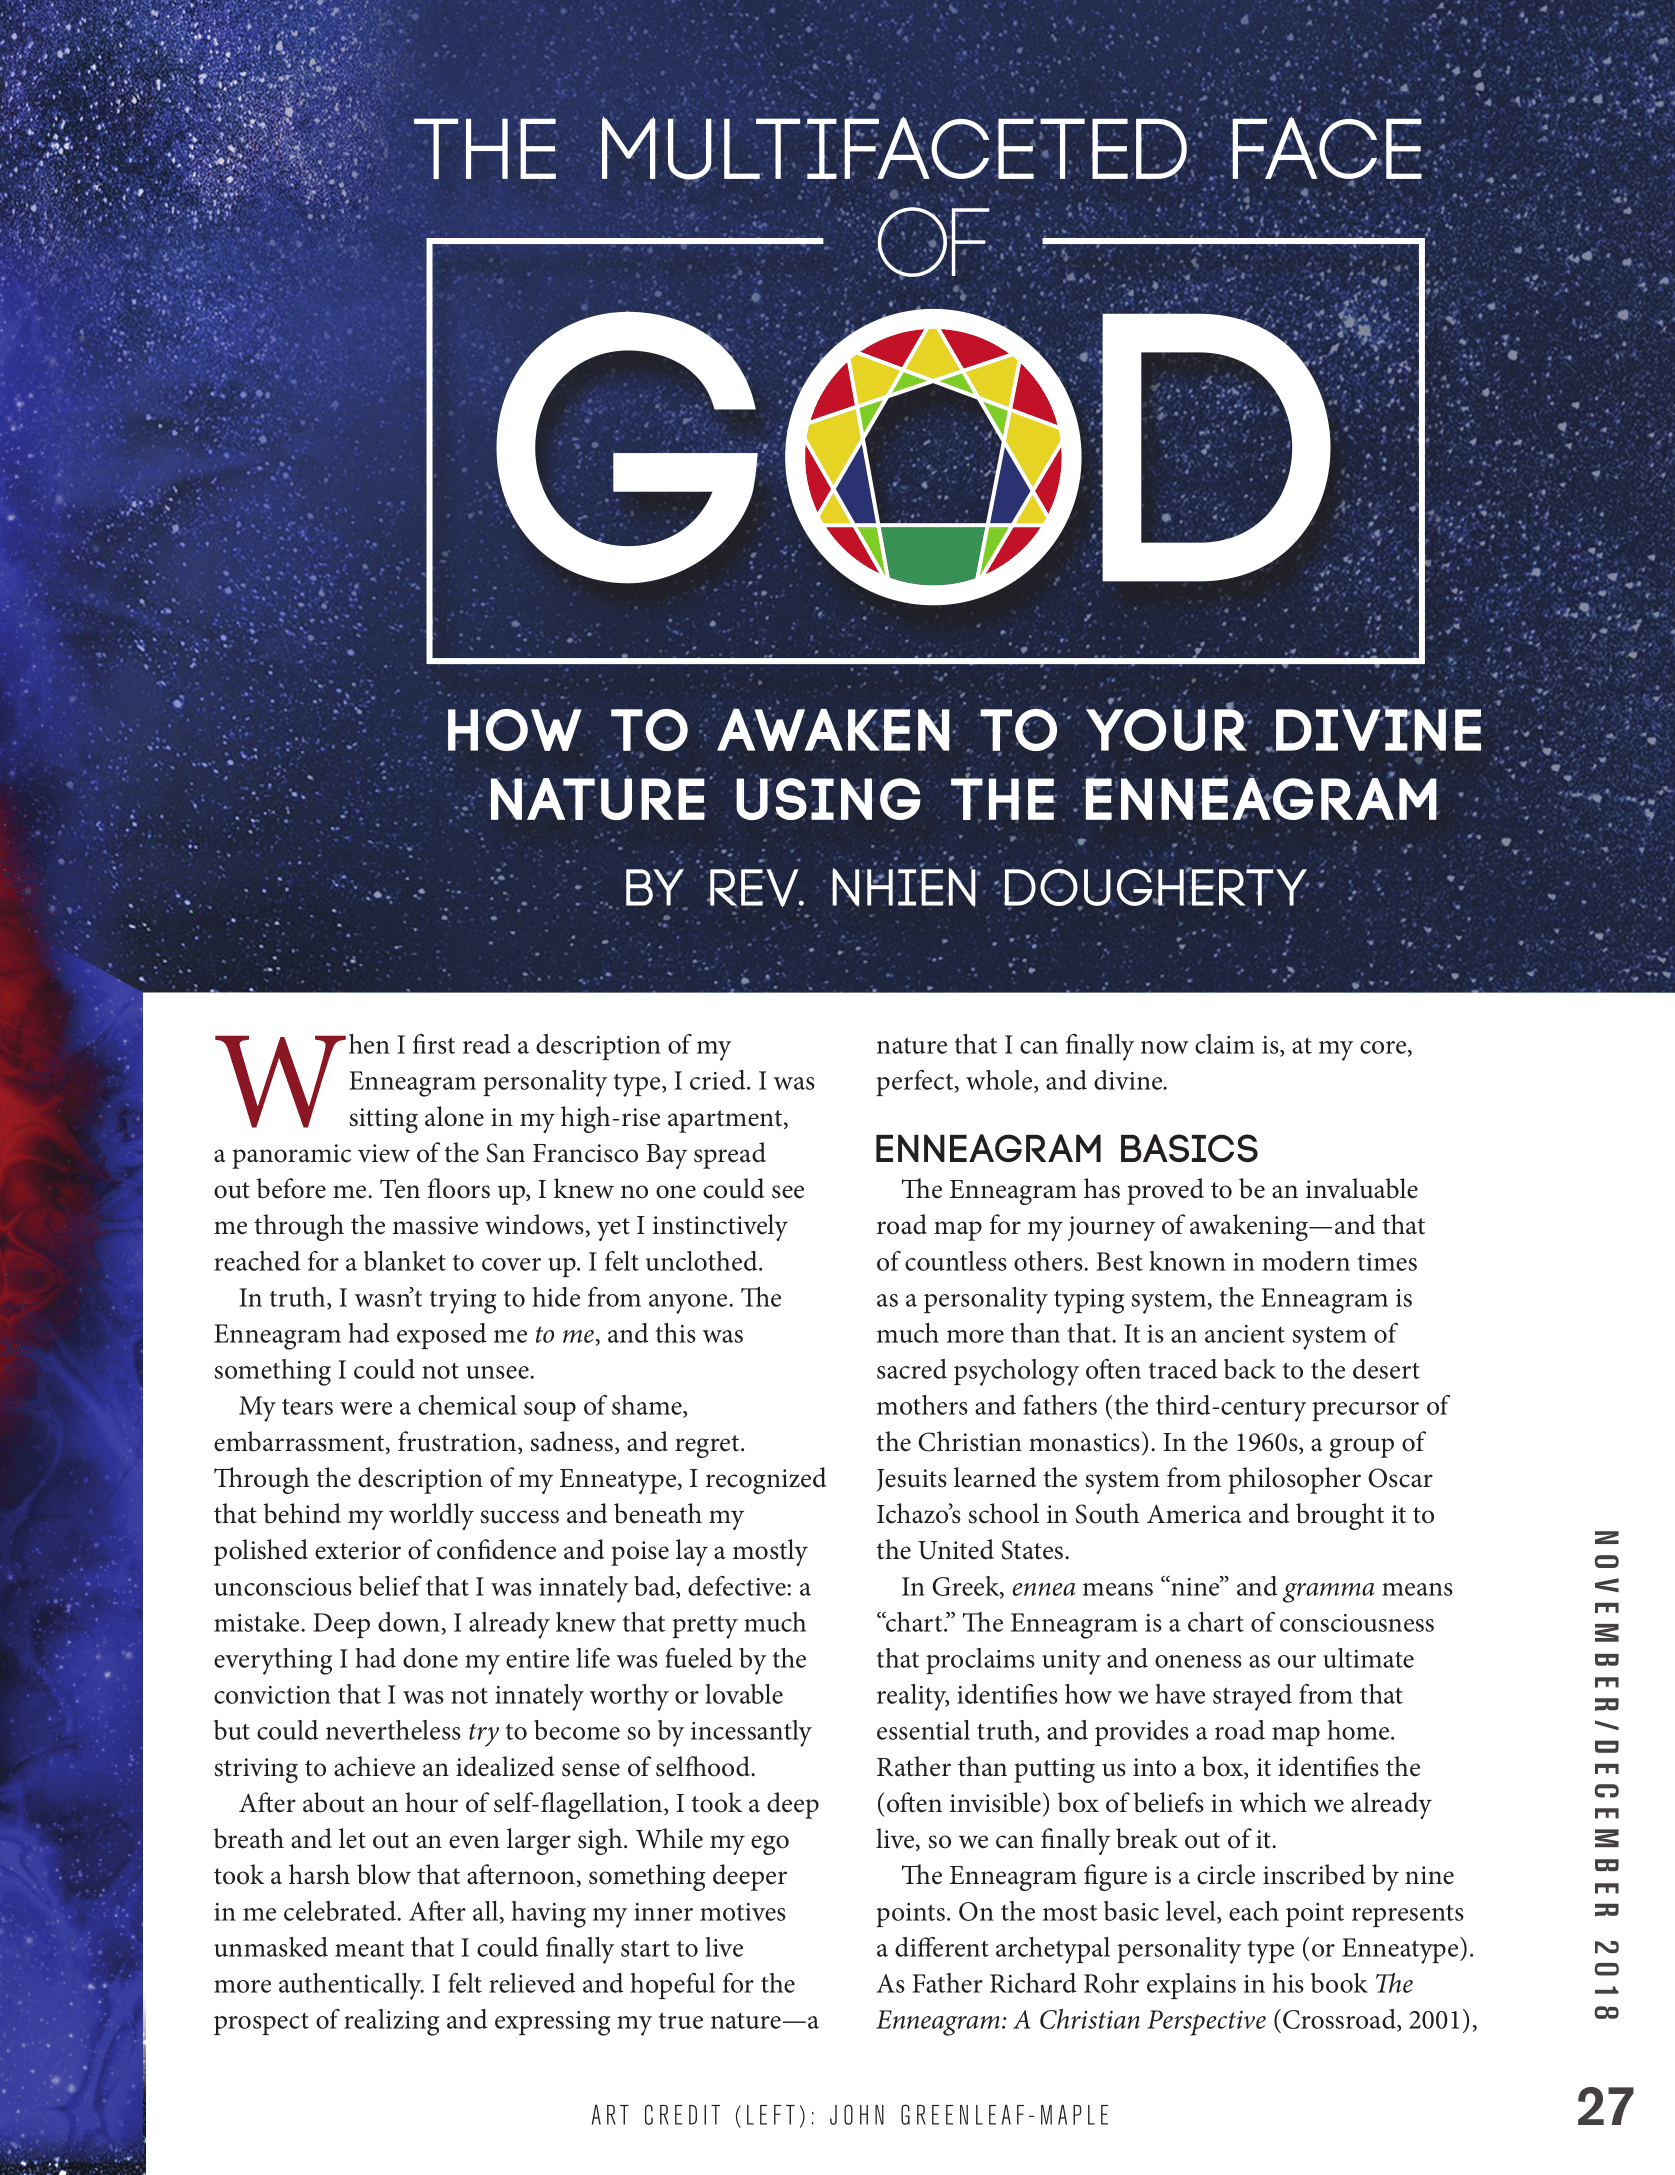 rev-nhien-vuong-dougherty-multifaced-face-god-enneagram-2.png